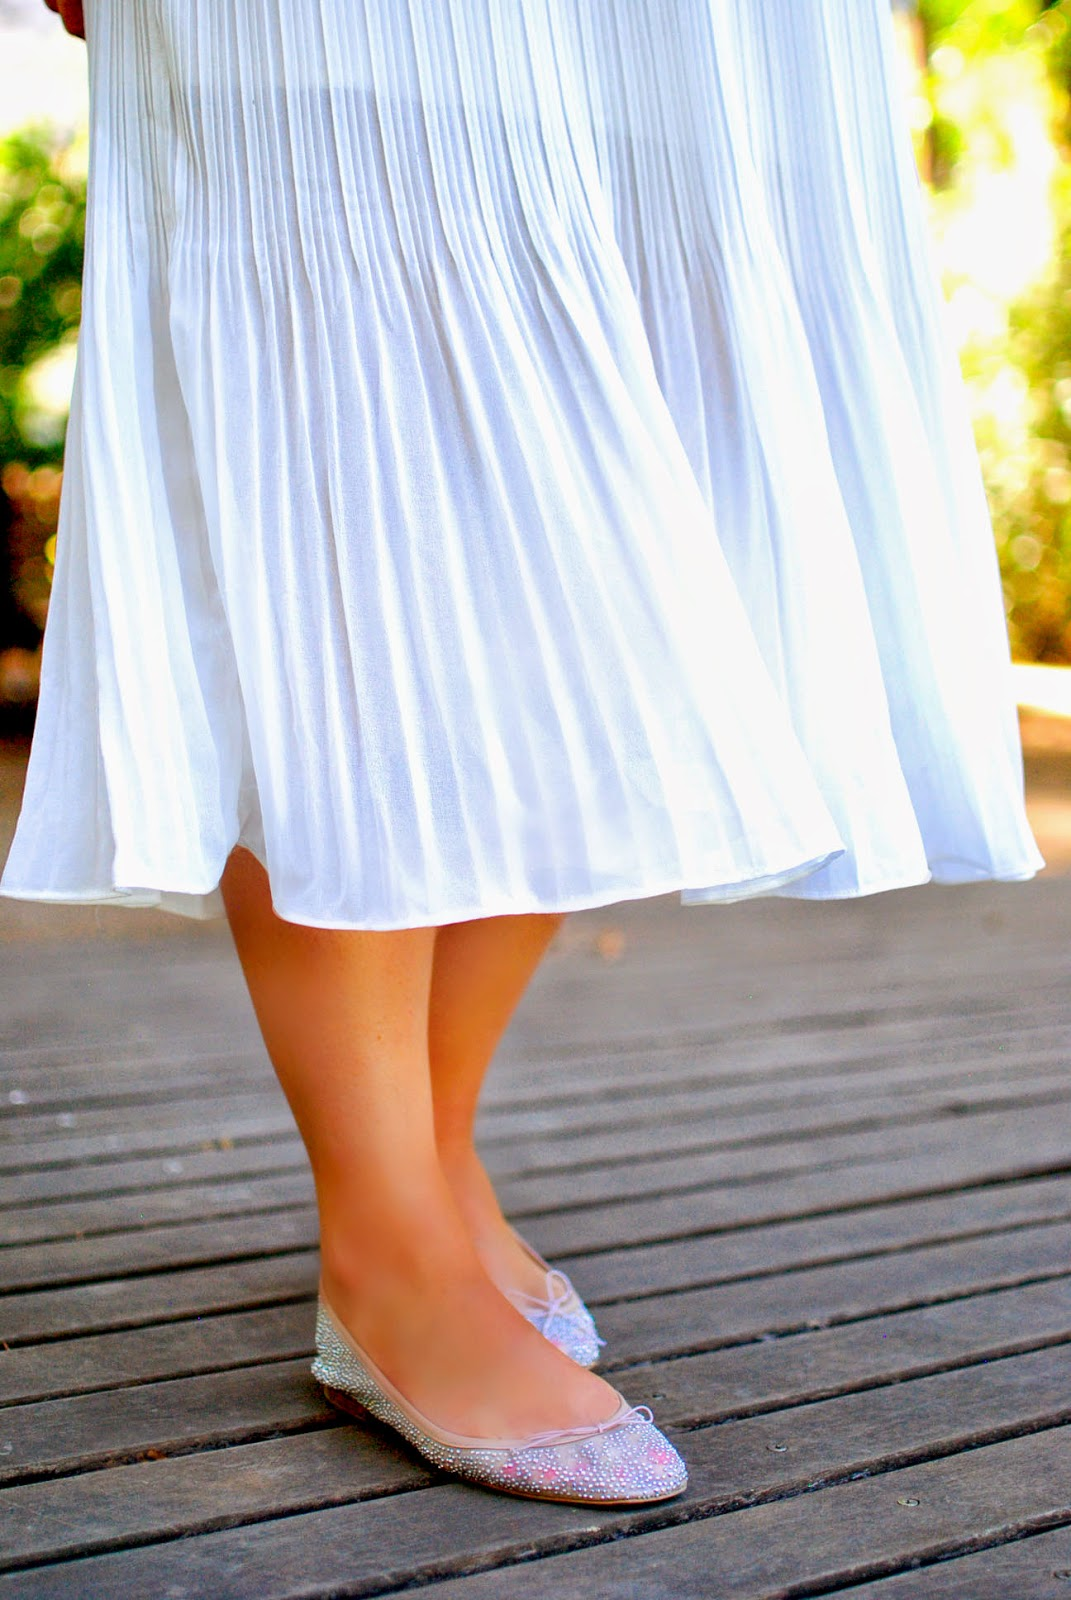 nery hdez, darccy, vestido vintage, vintage dress, white dress. midi dress, bailarinas, fllats